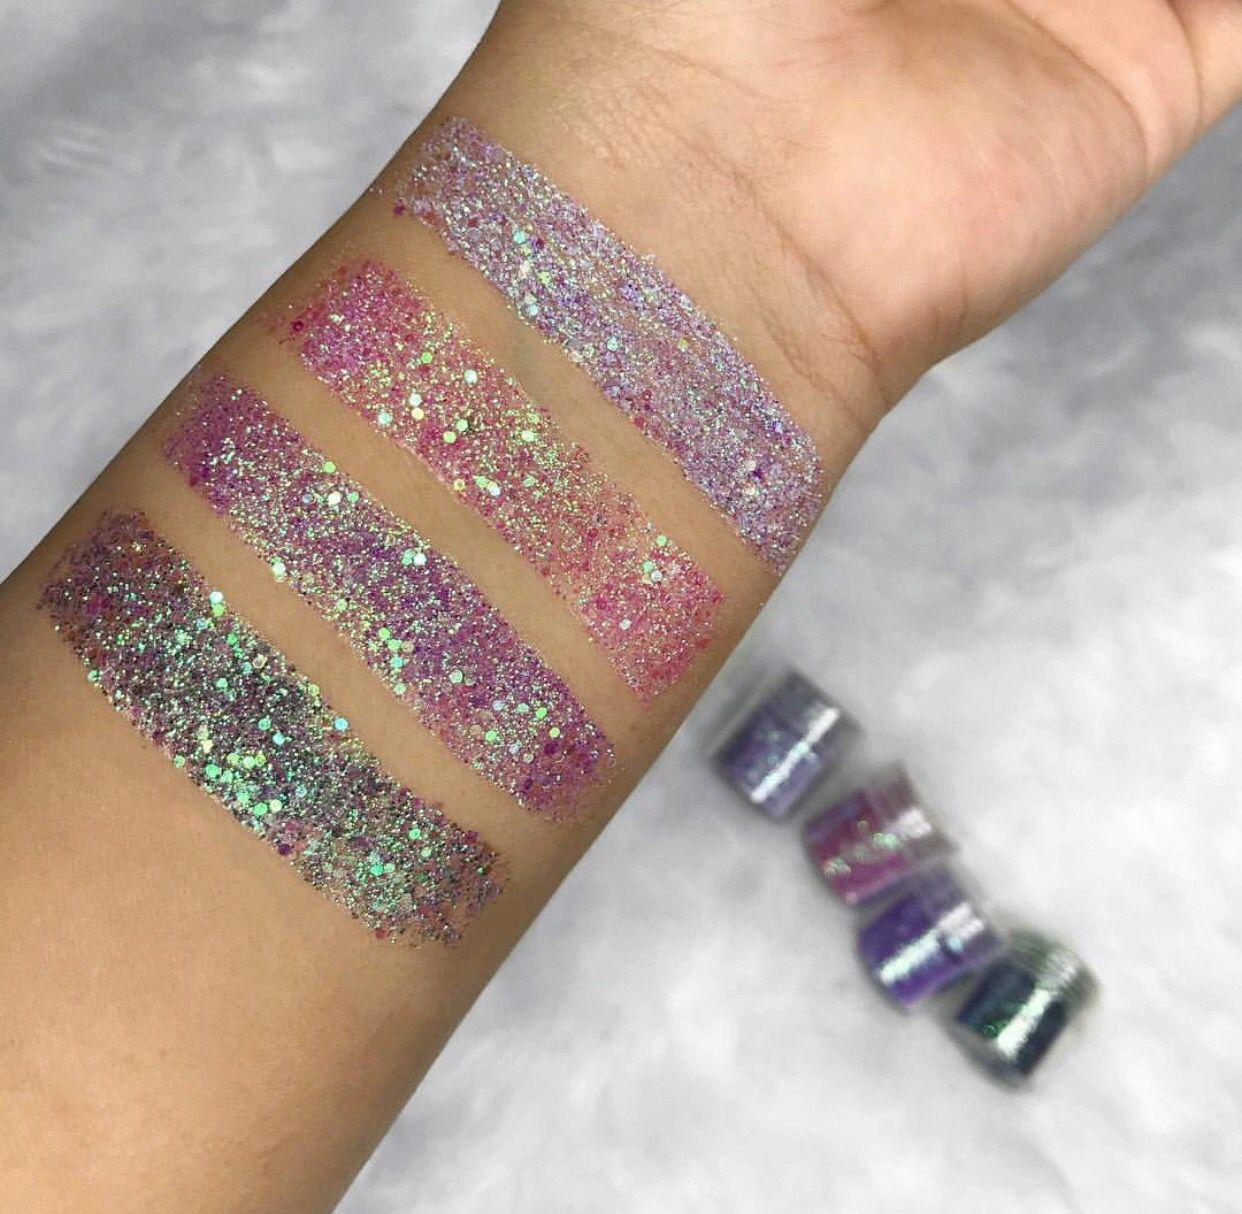 Loose Glitter from eBay Maquiagen